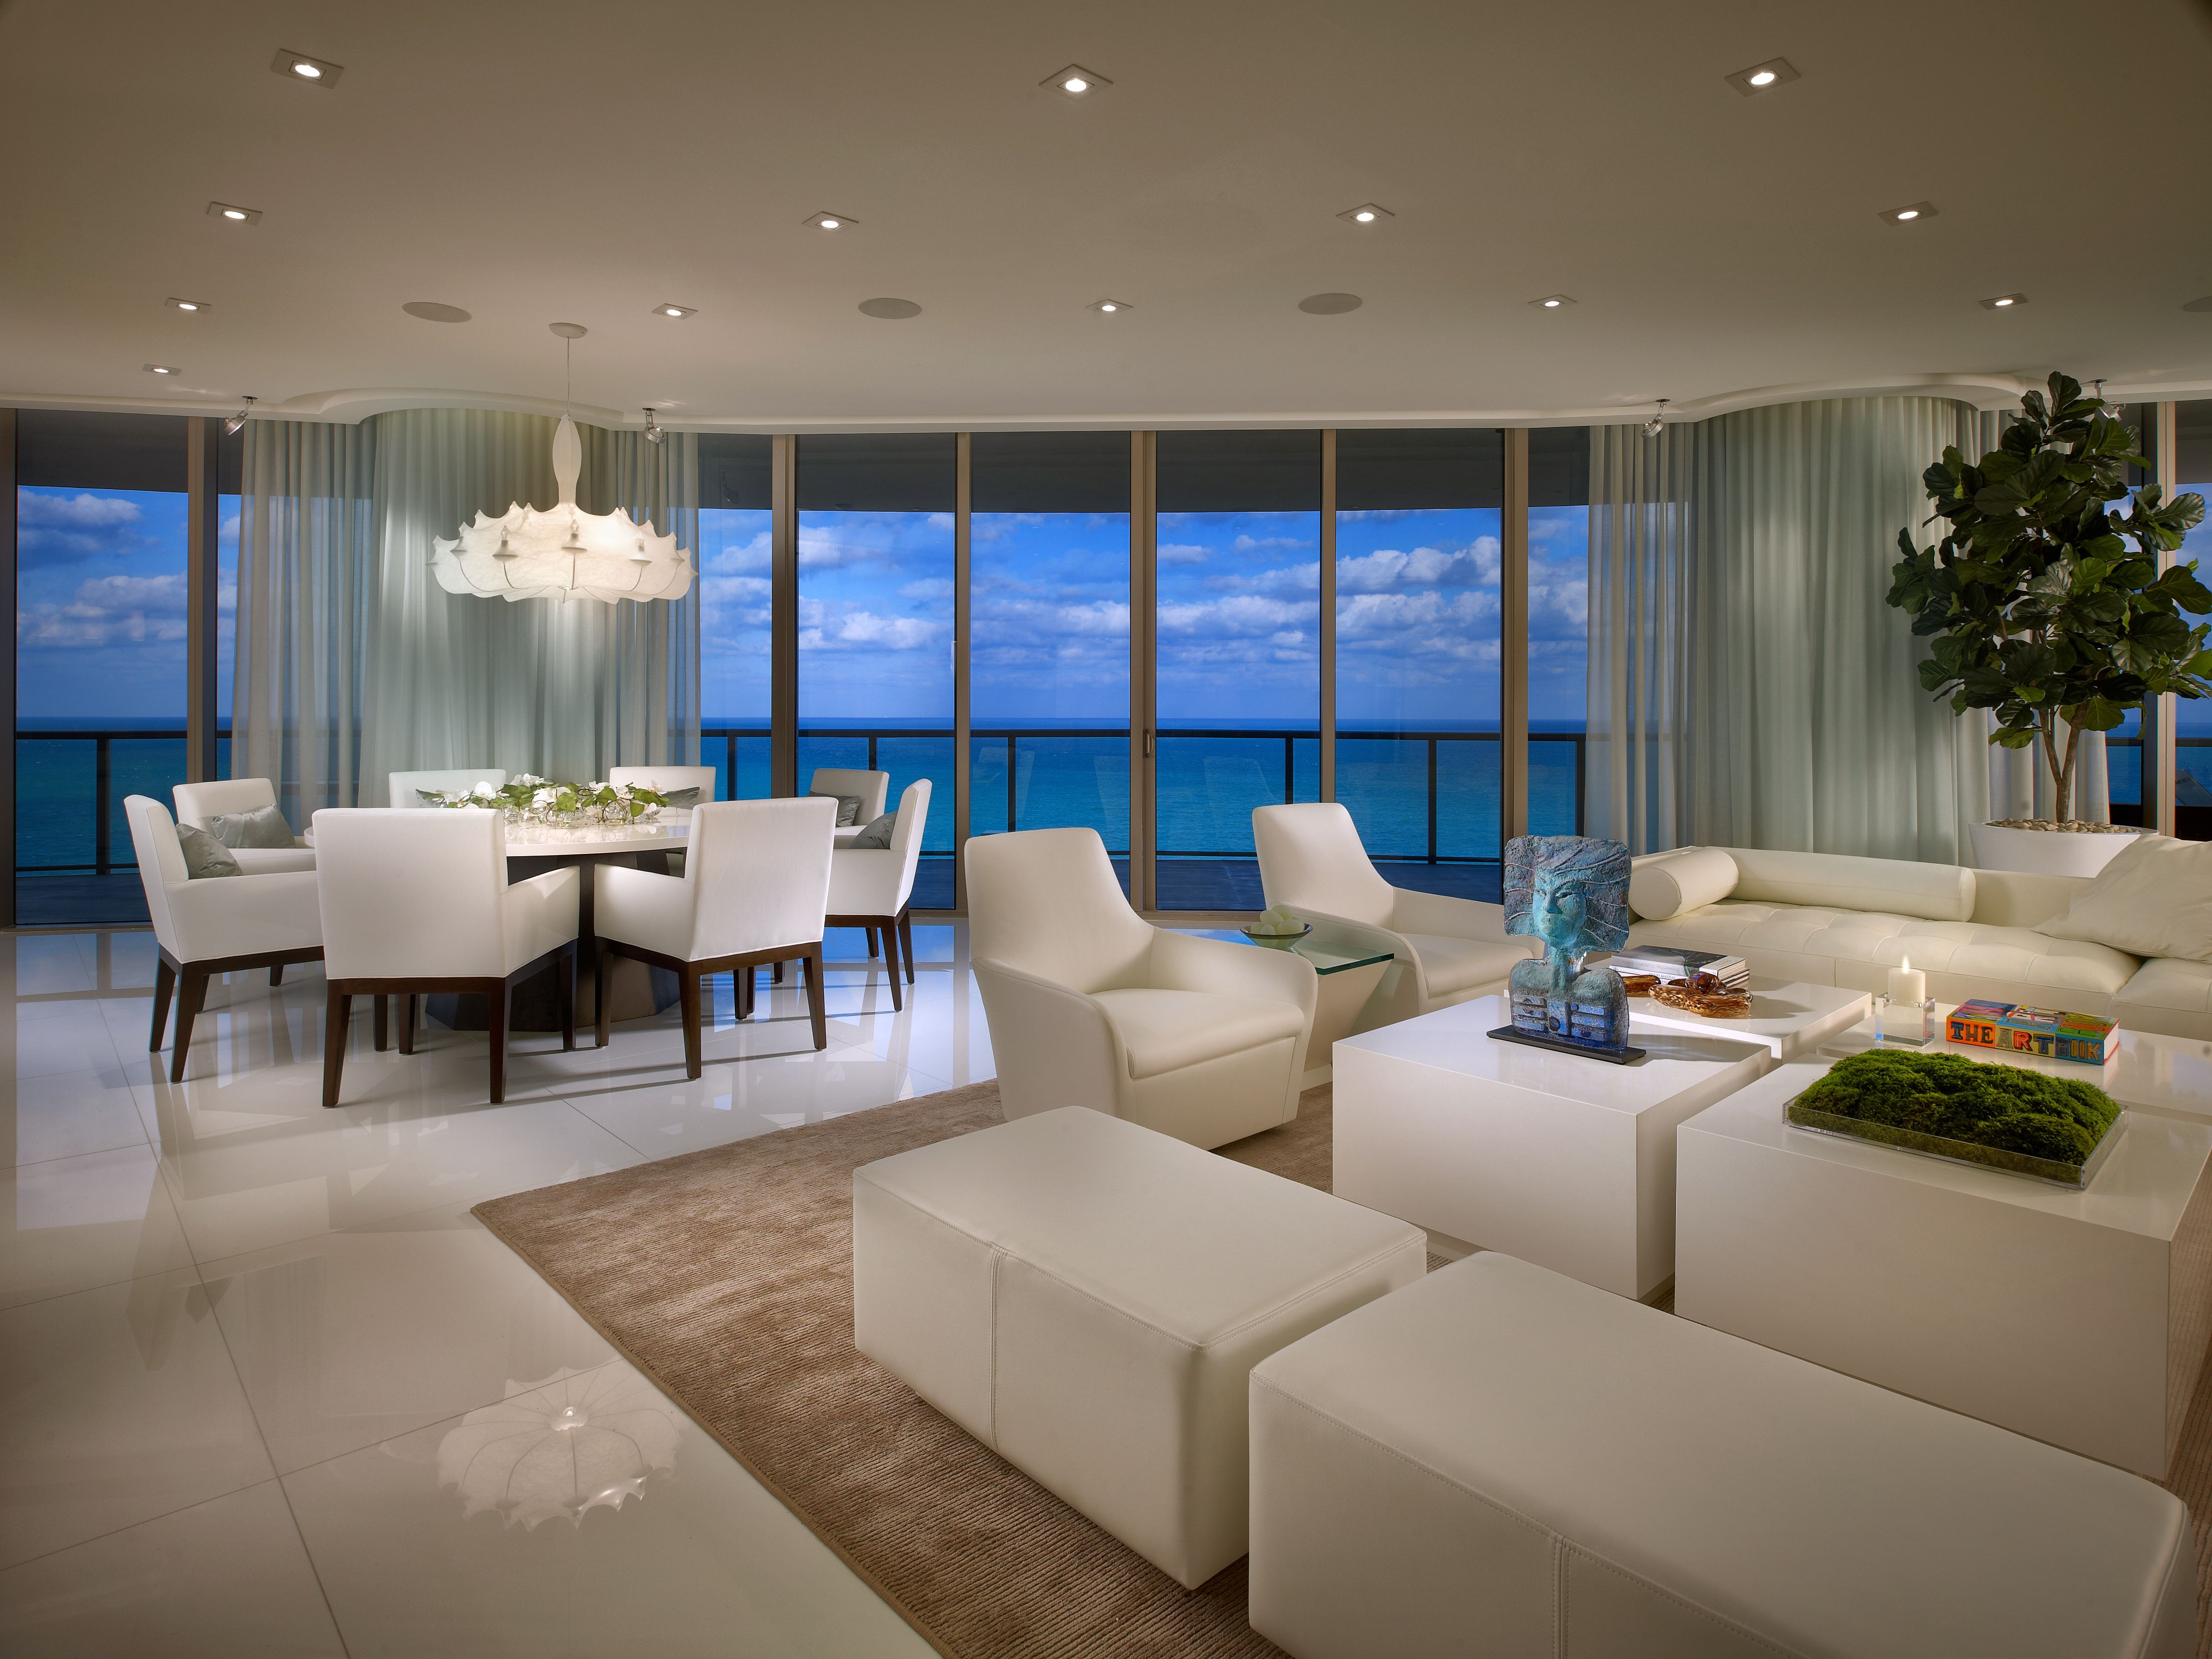 Contemporary Interior Design In South Florida Interiors By Steven G Luxury Interior Interior Design Contemporary Interior Design